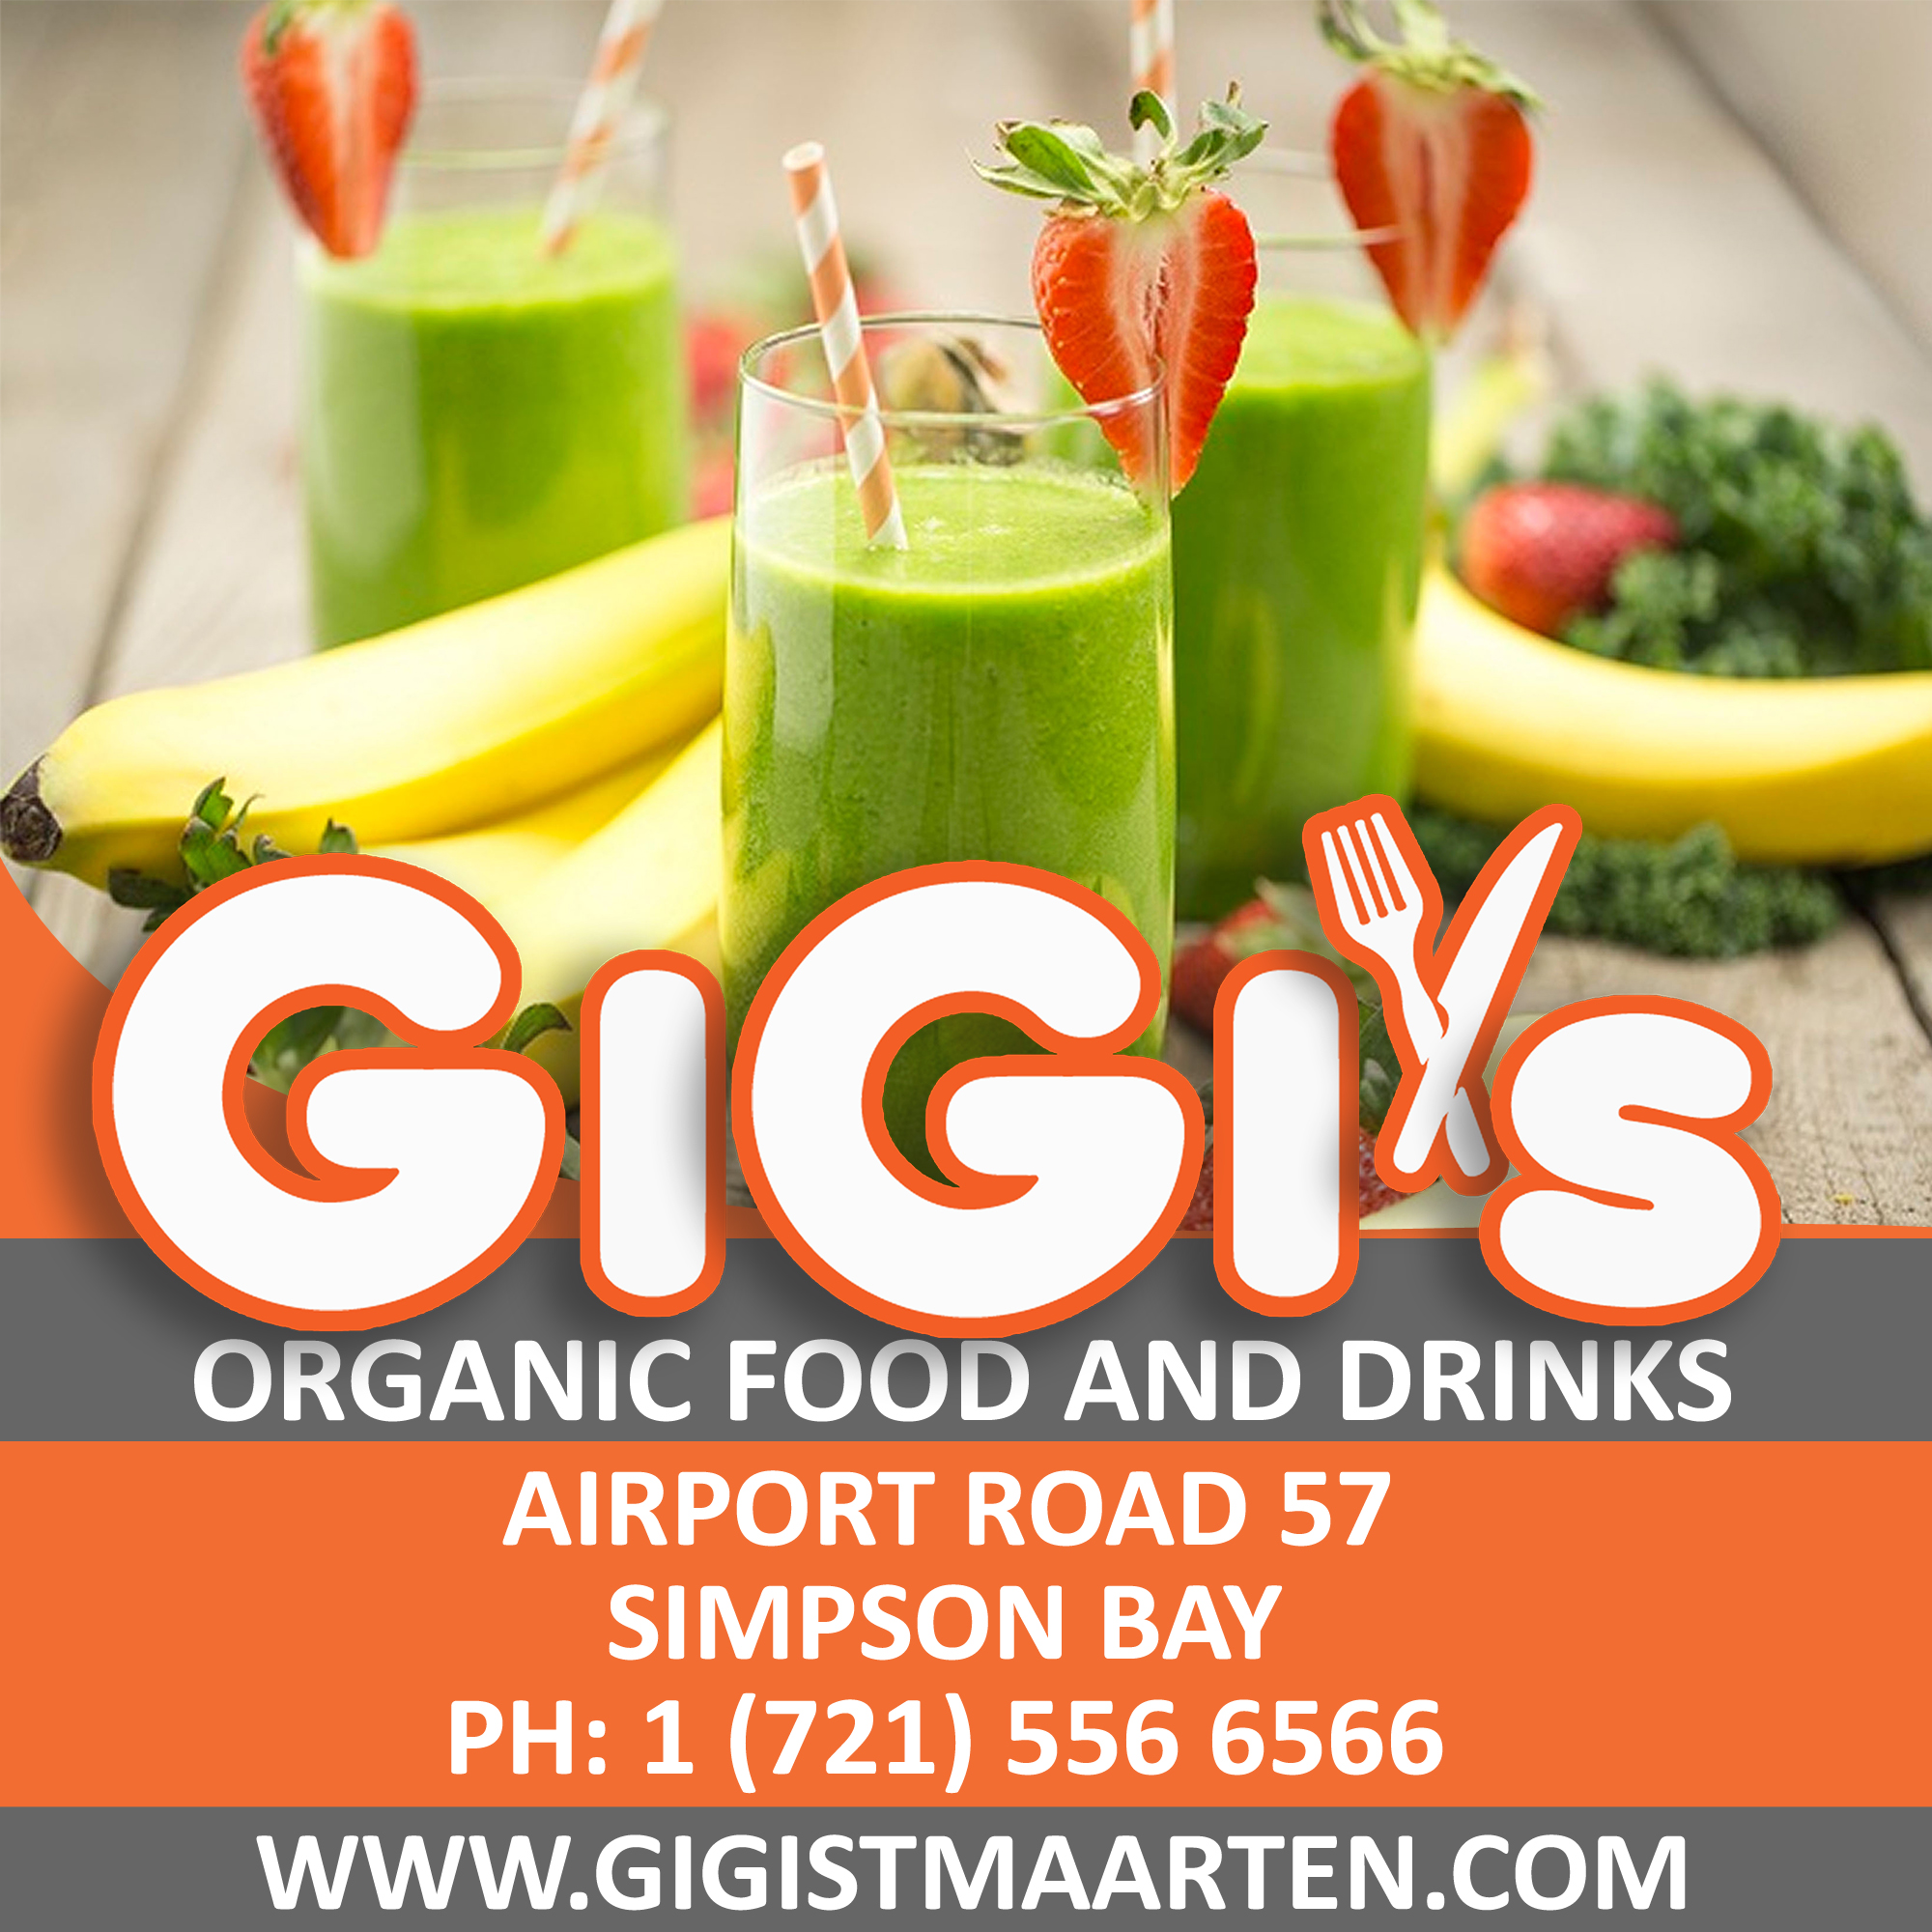 Gigis St. Maarten